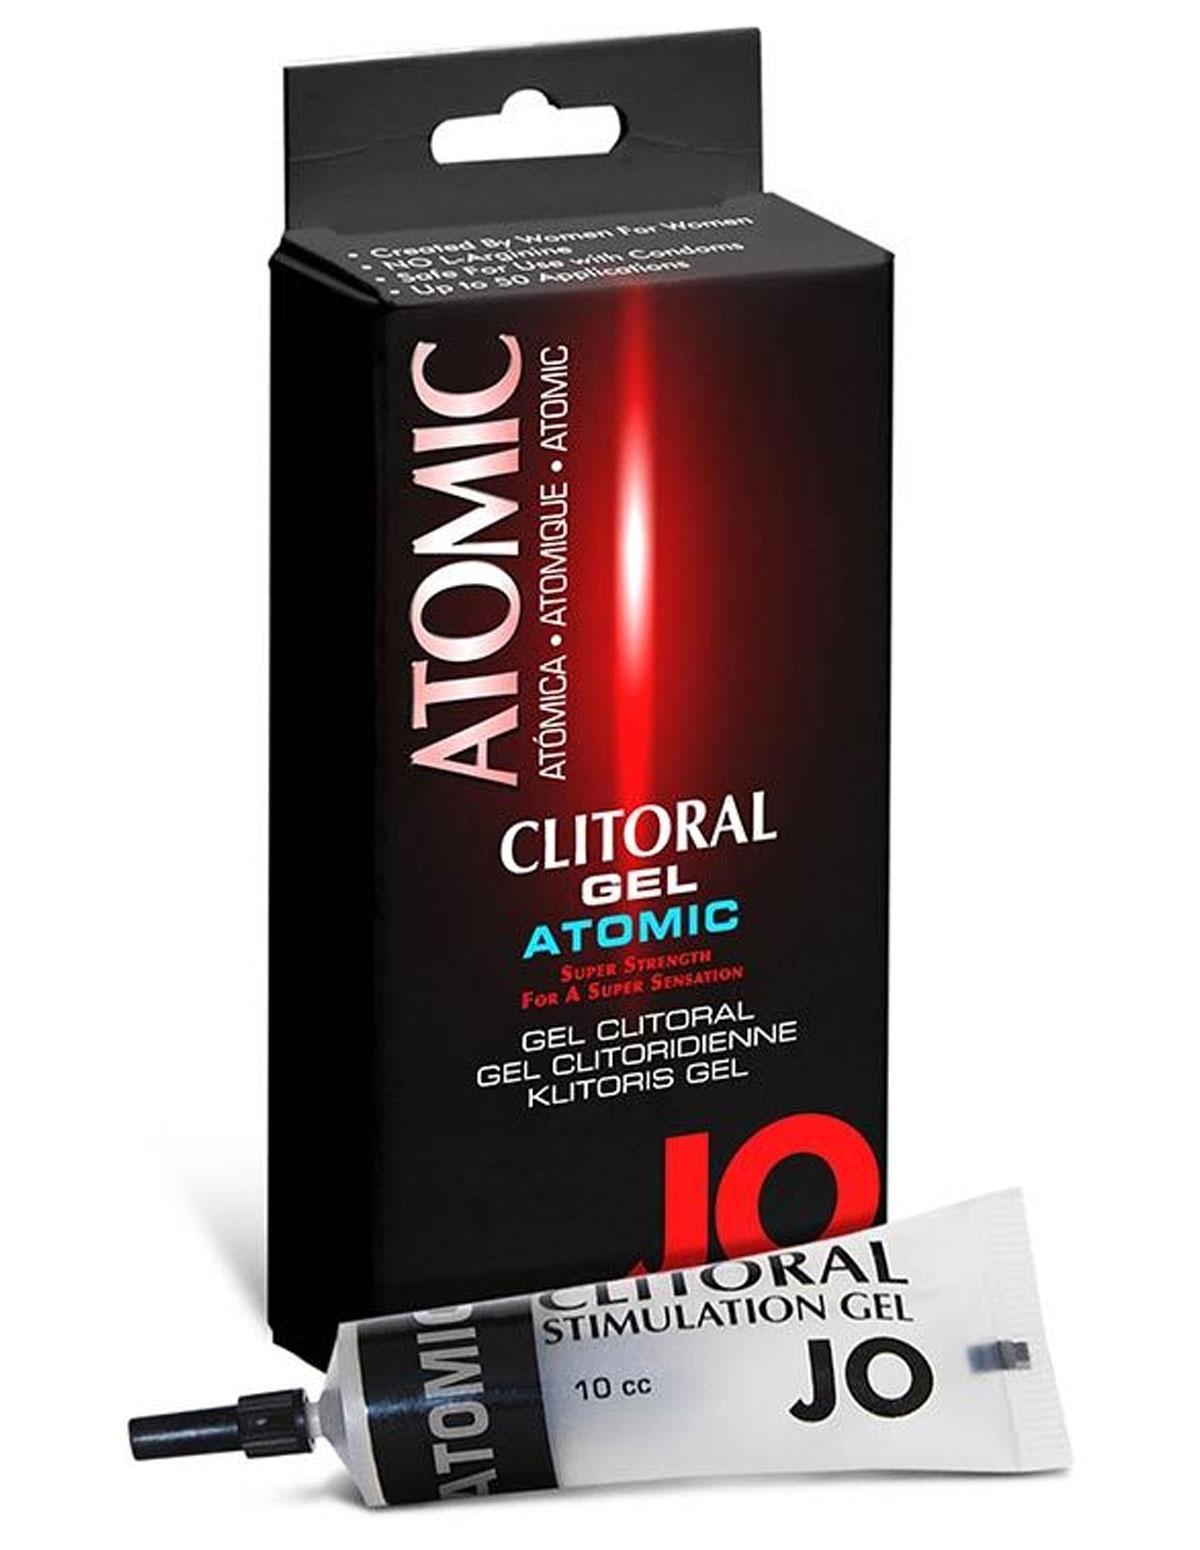 Atomic System Jo Clitoral Gel